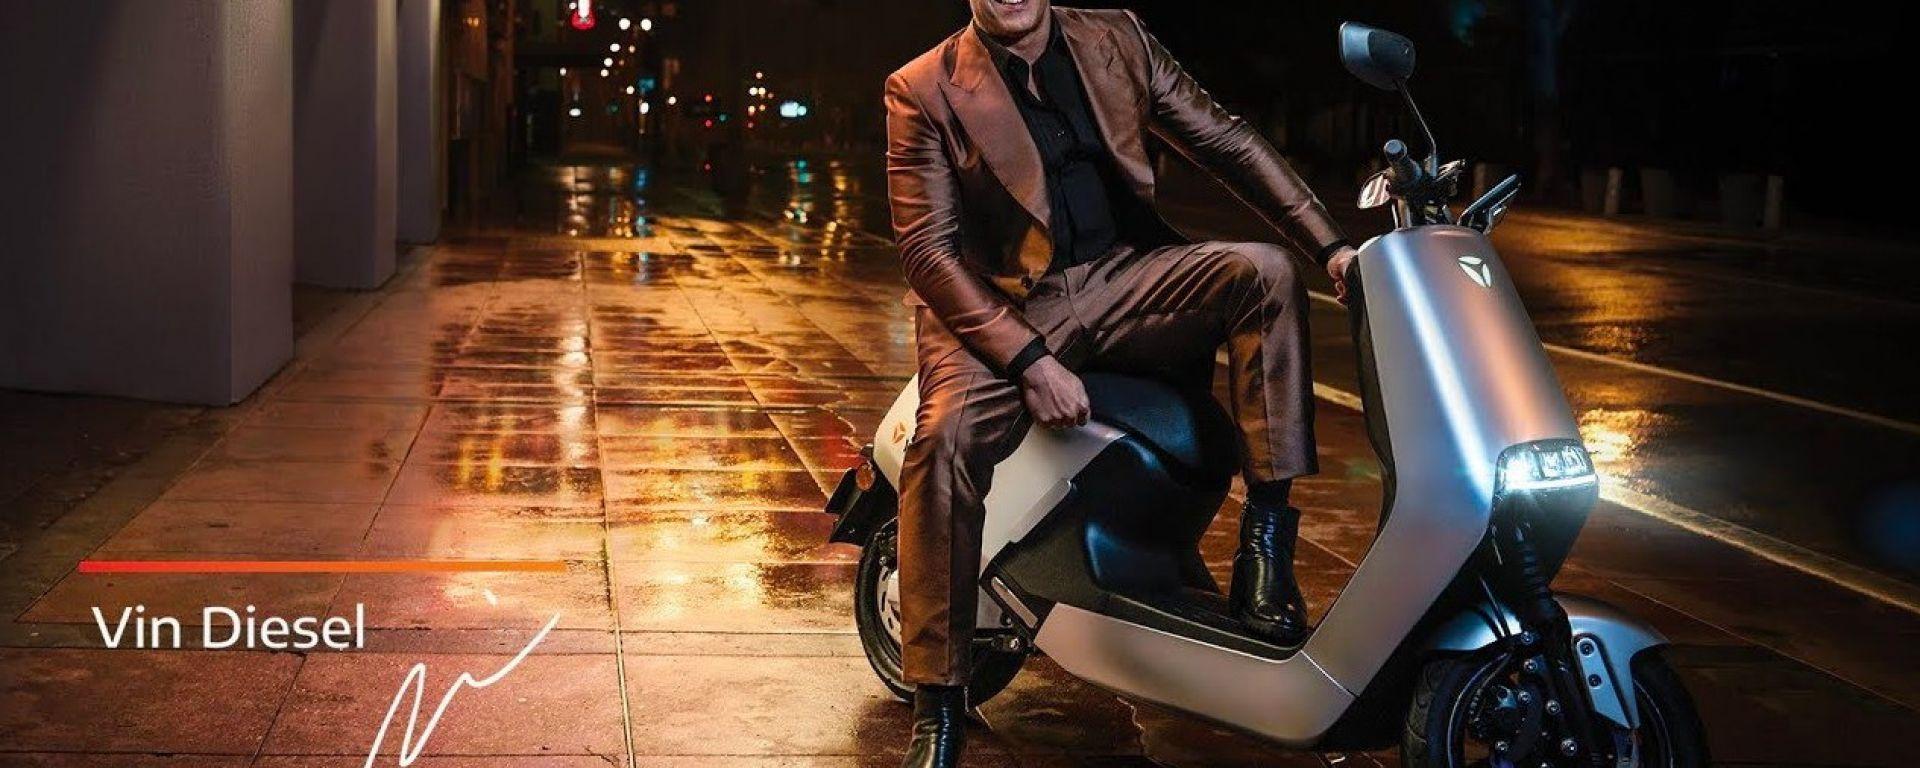 Yadea G5 è l'arma segreta di Vin Diesel